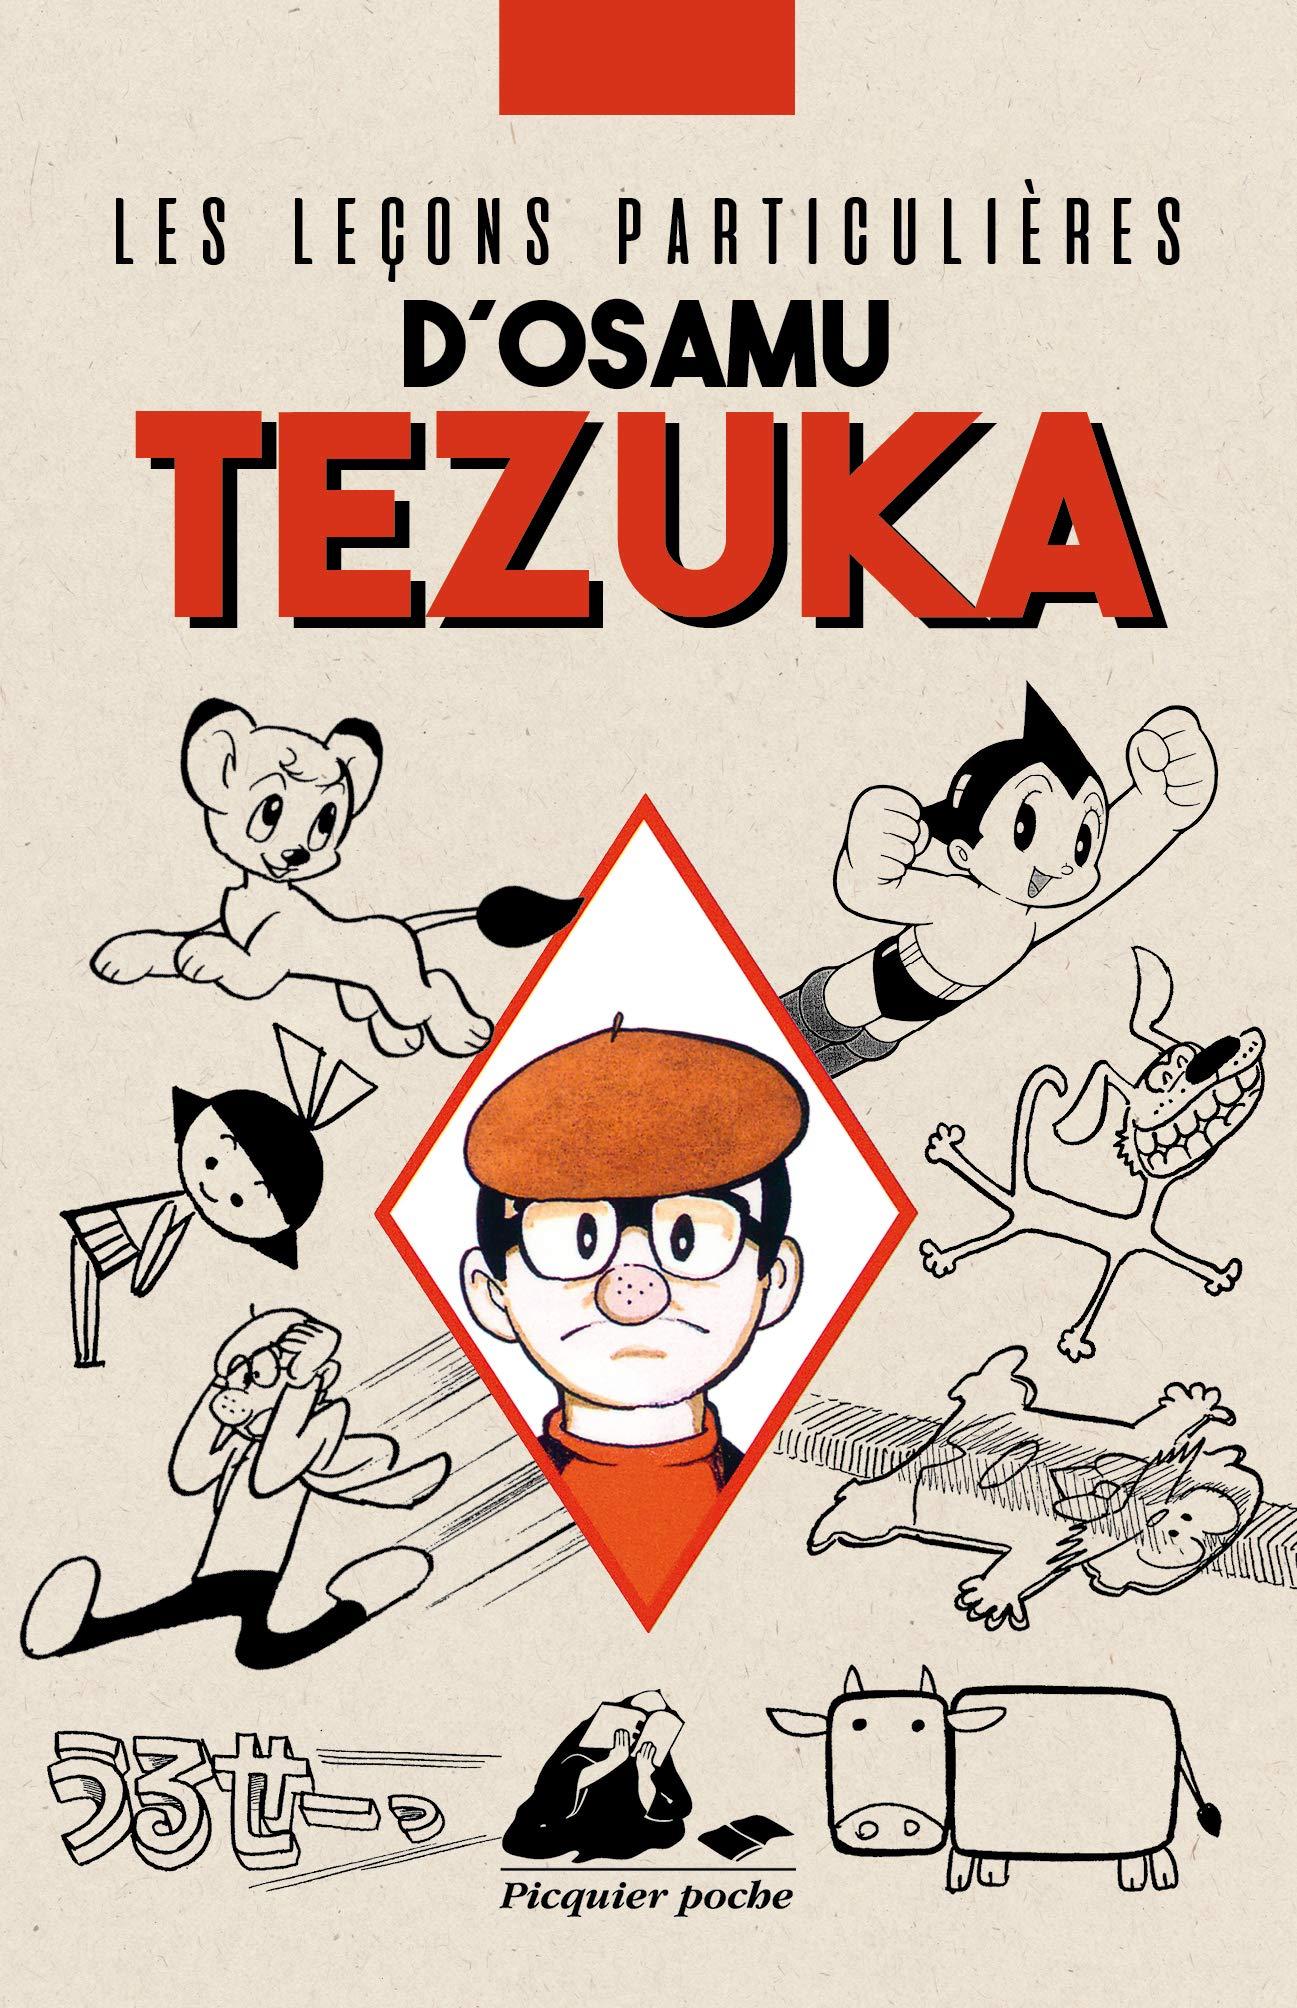 Les Leçons particulières d'Osamu Tezuka 1